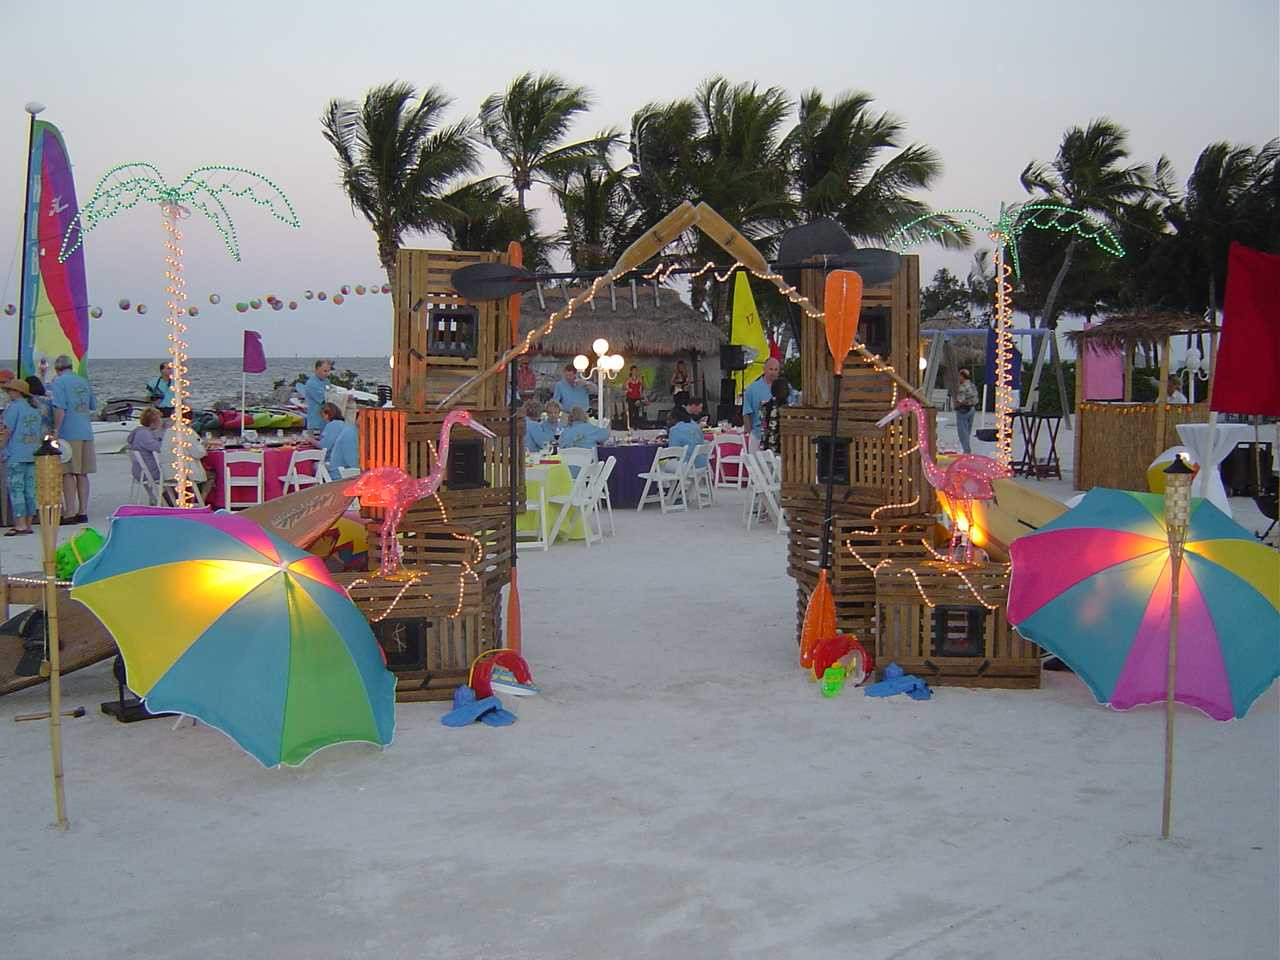 Best Beach Party Ideas  Beach Party at Florida Avenue Park – Bates Area Civic